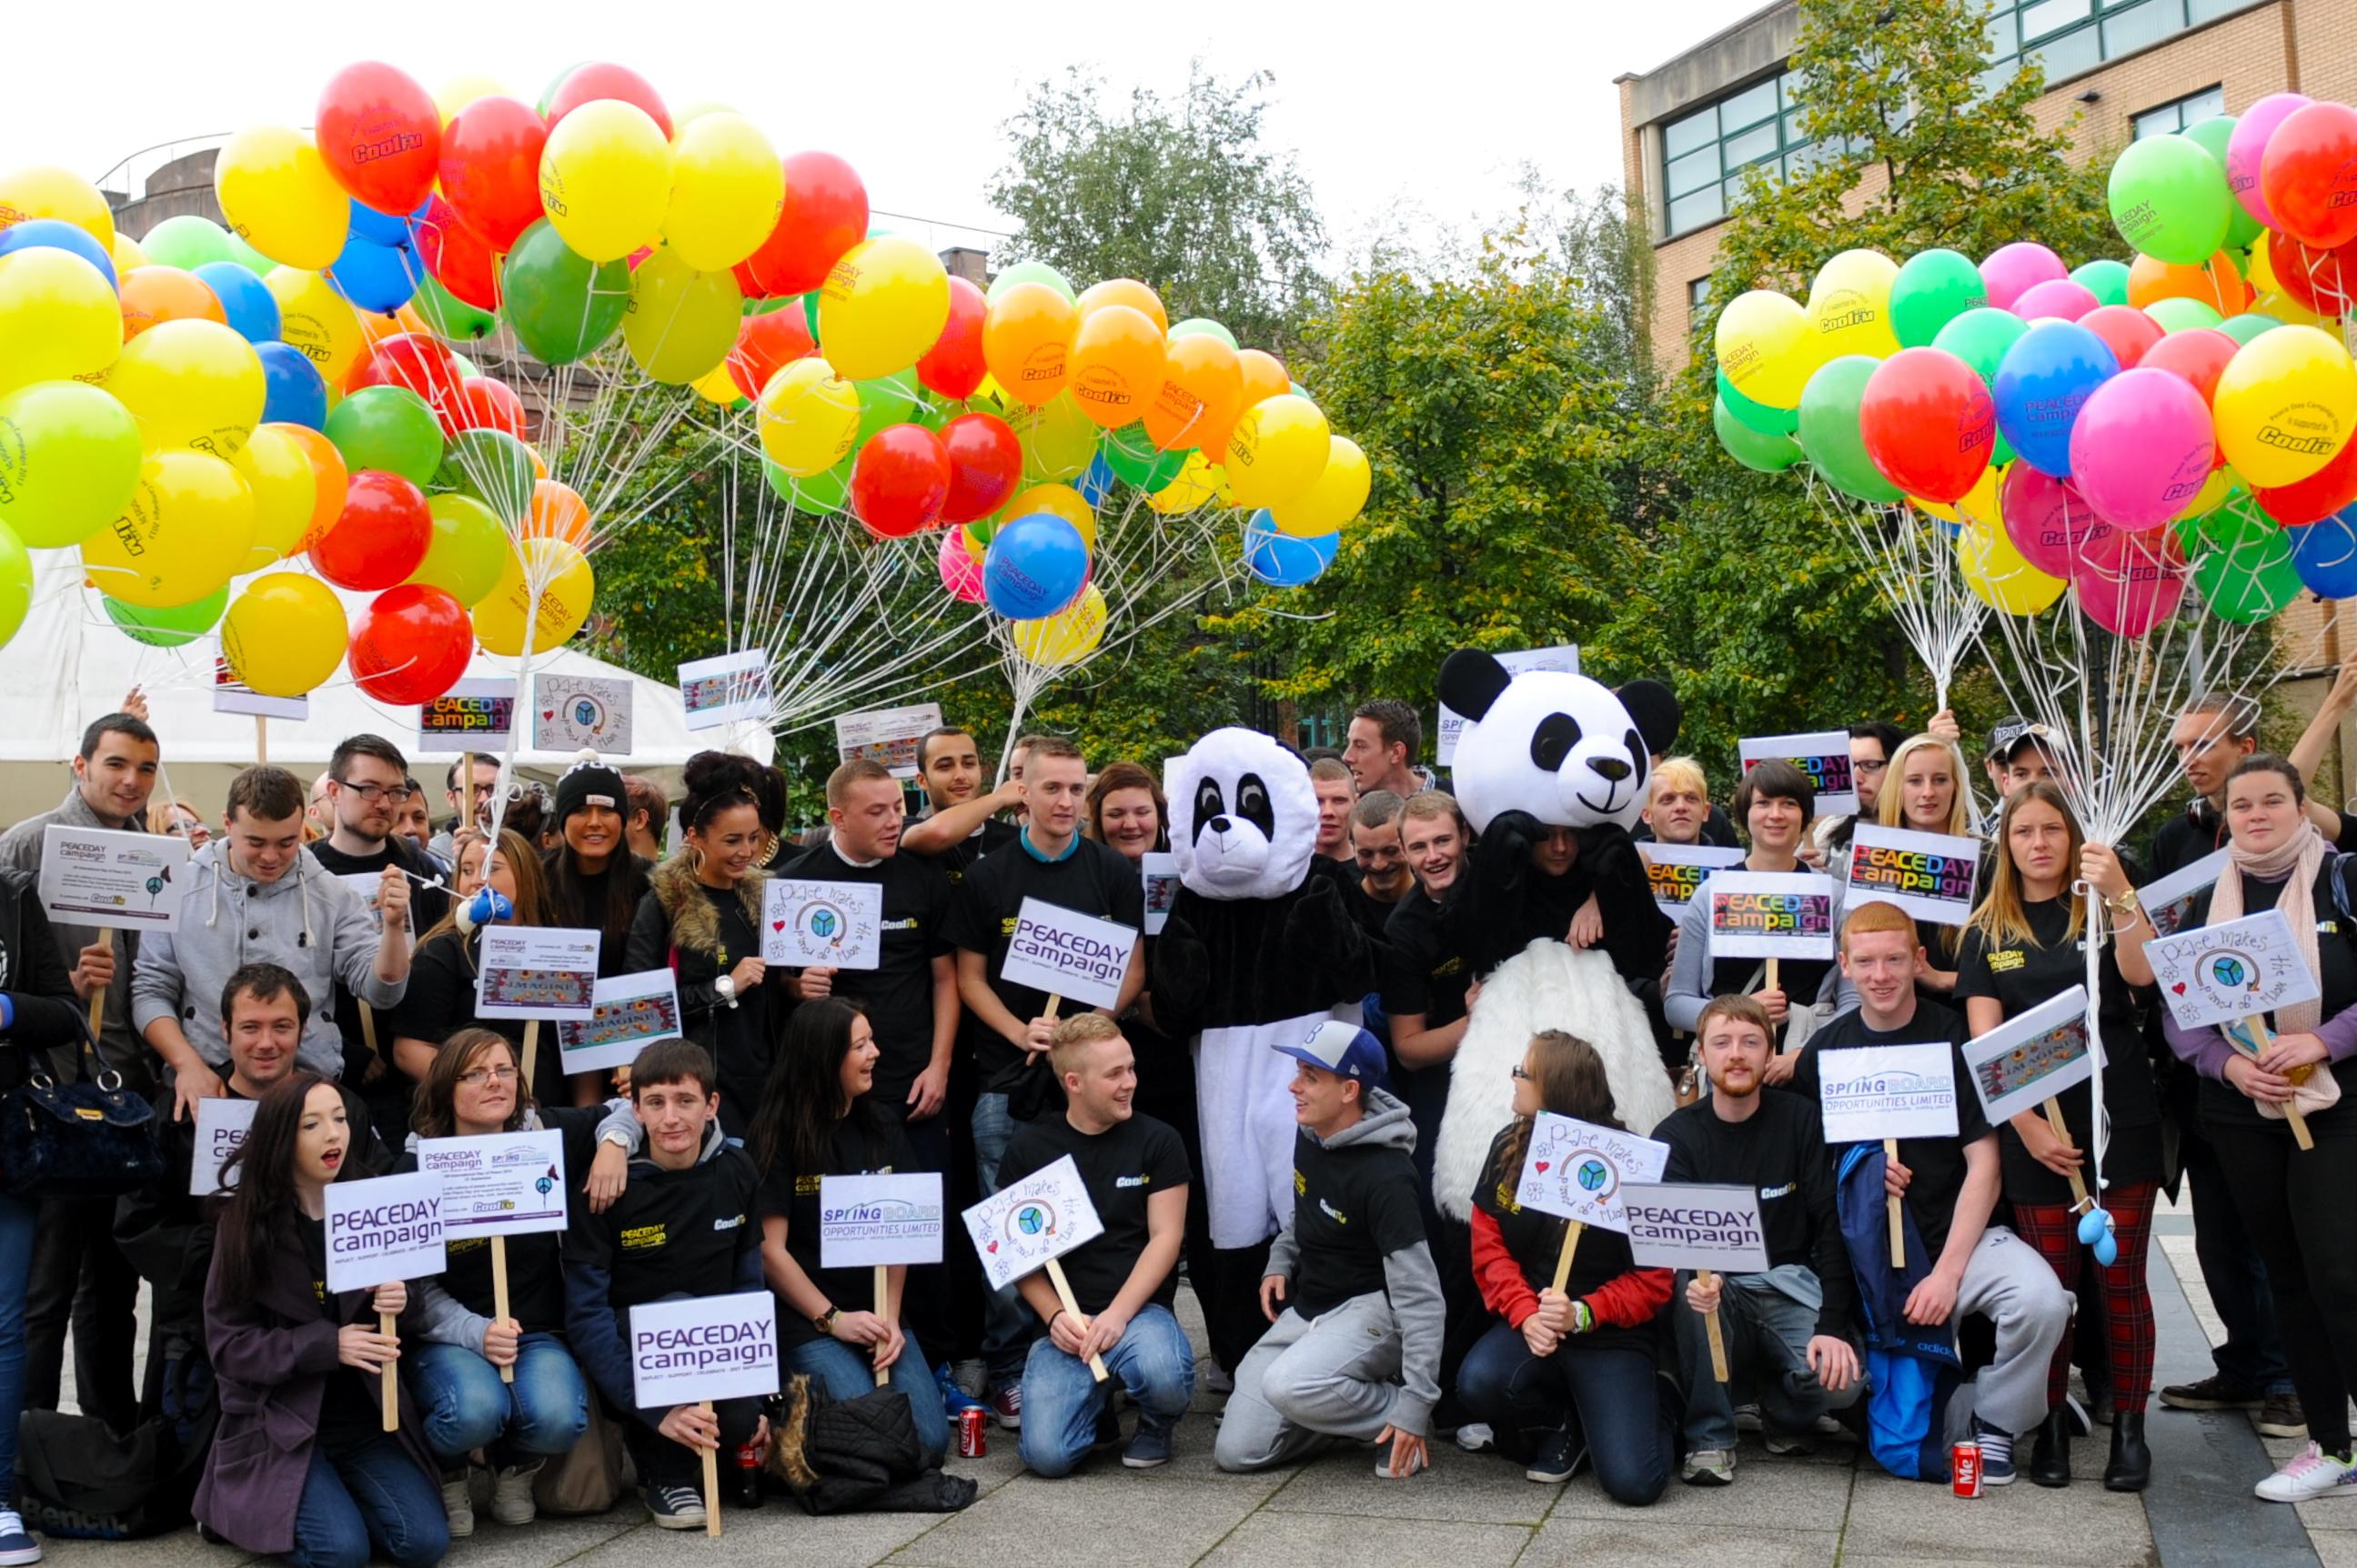 20130920 UN Peace Day DSC_7363